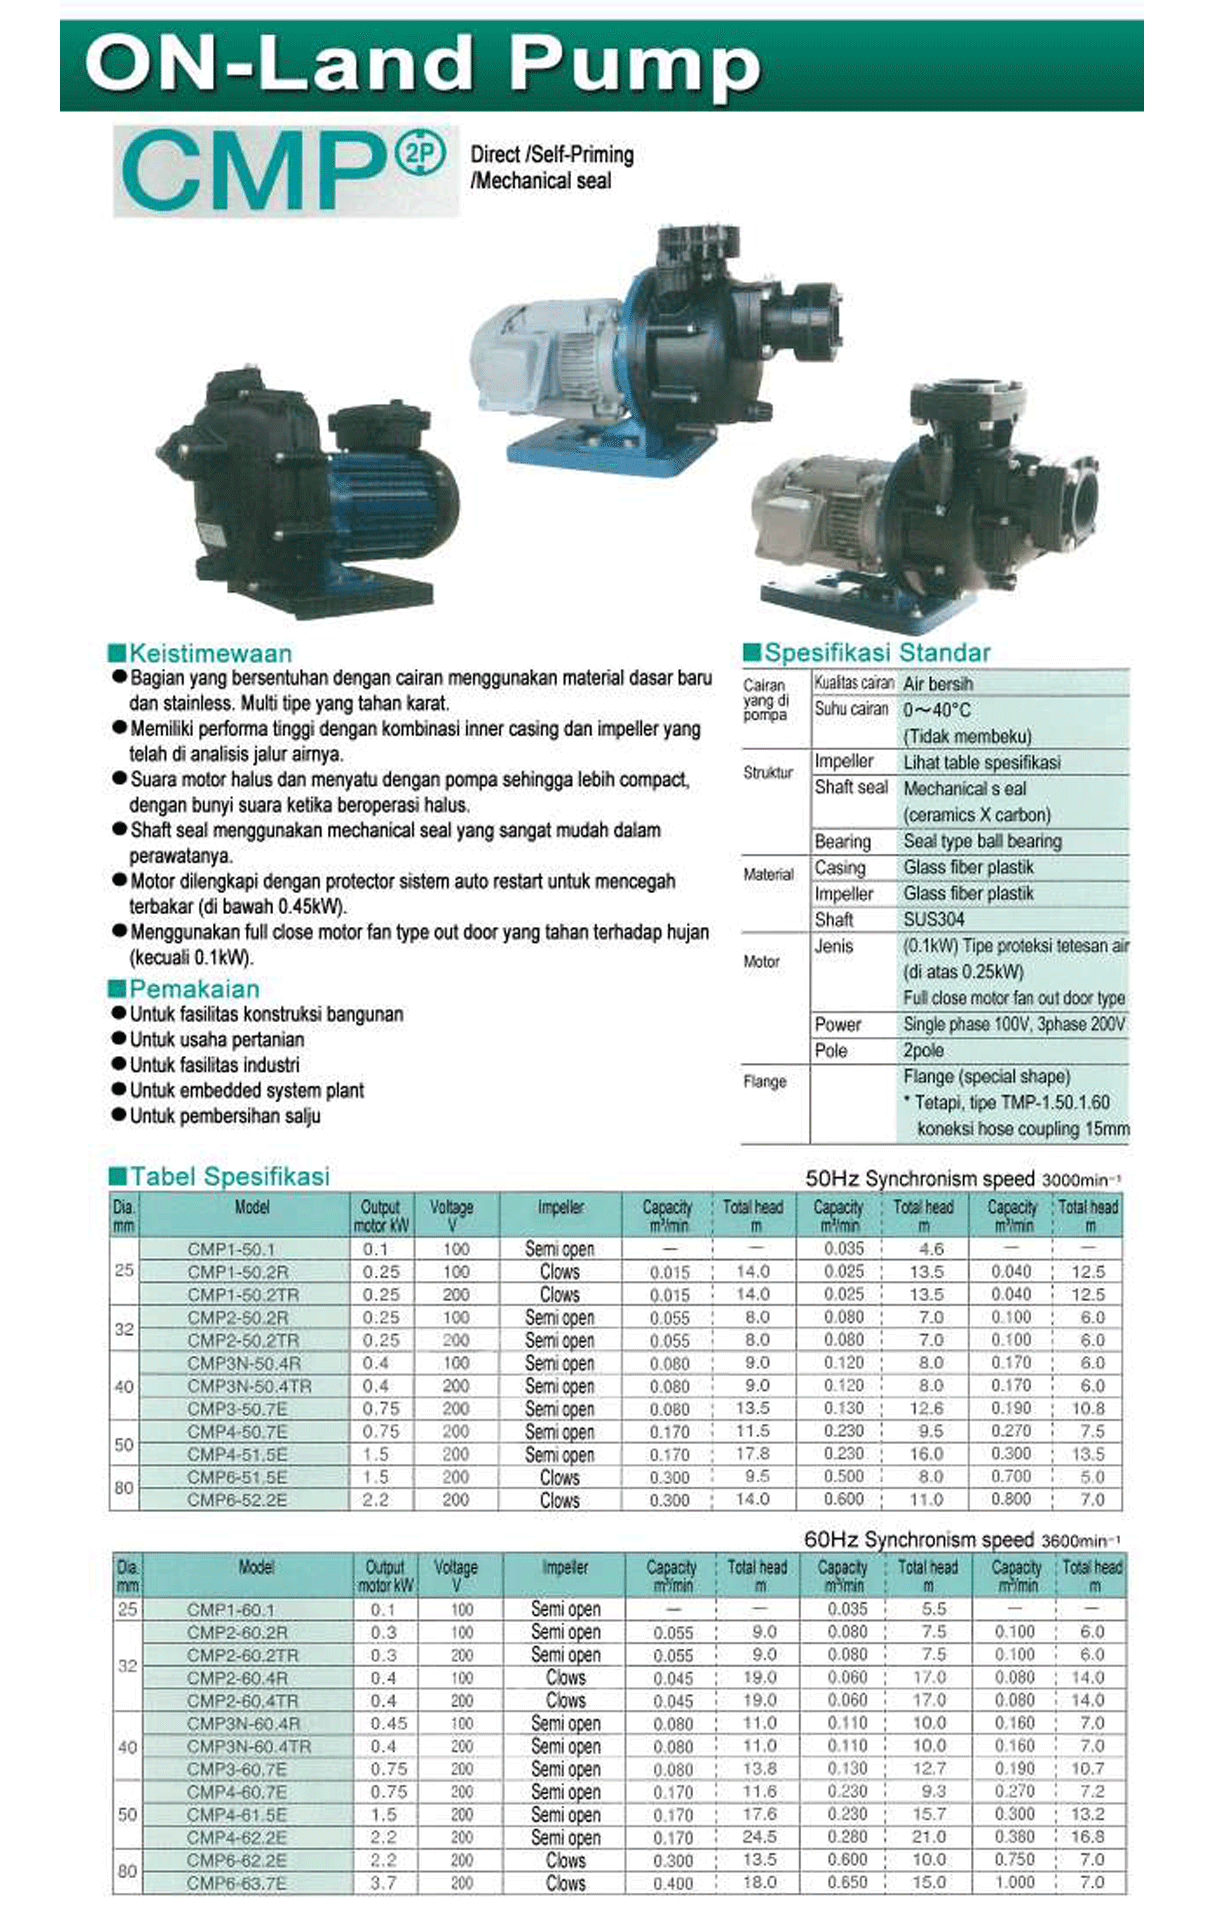 On-Land Pump CMP (2P)